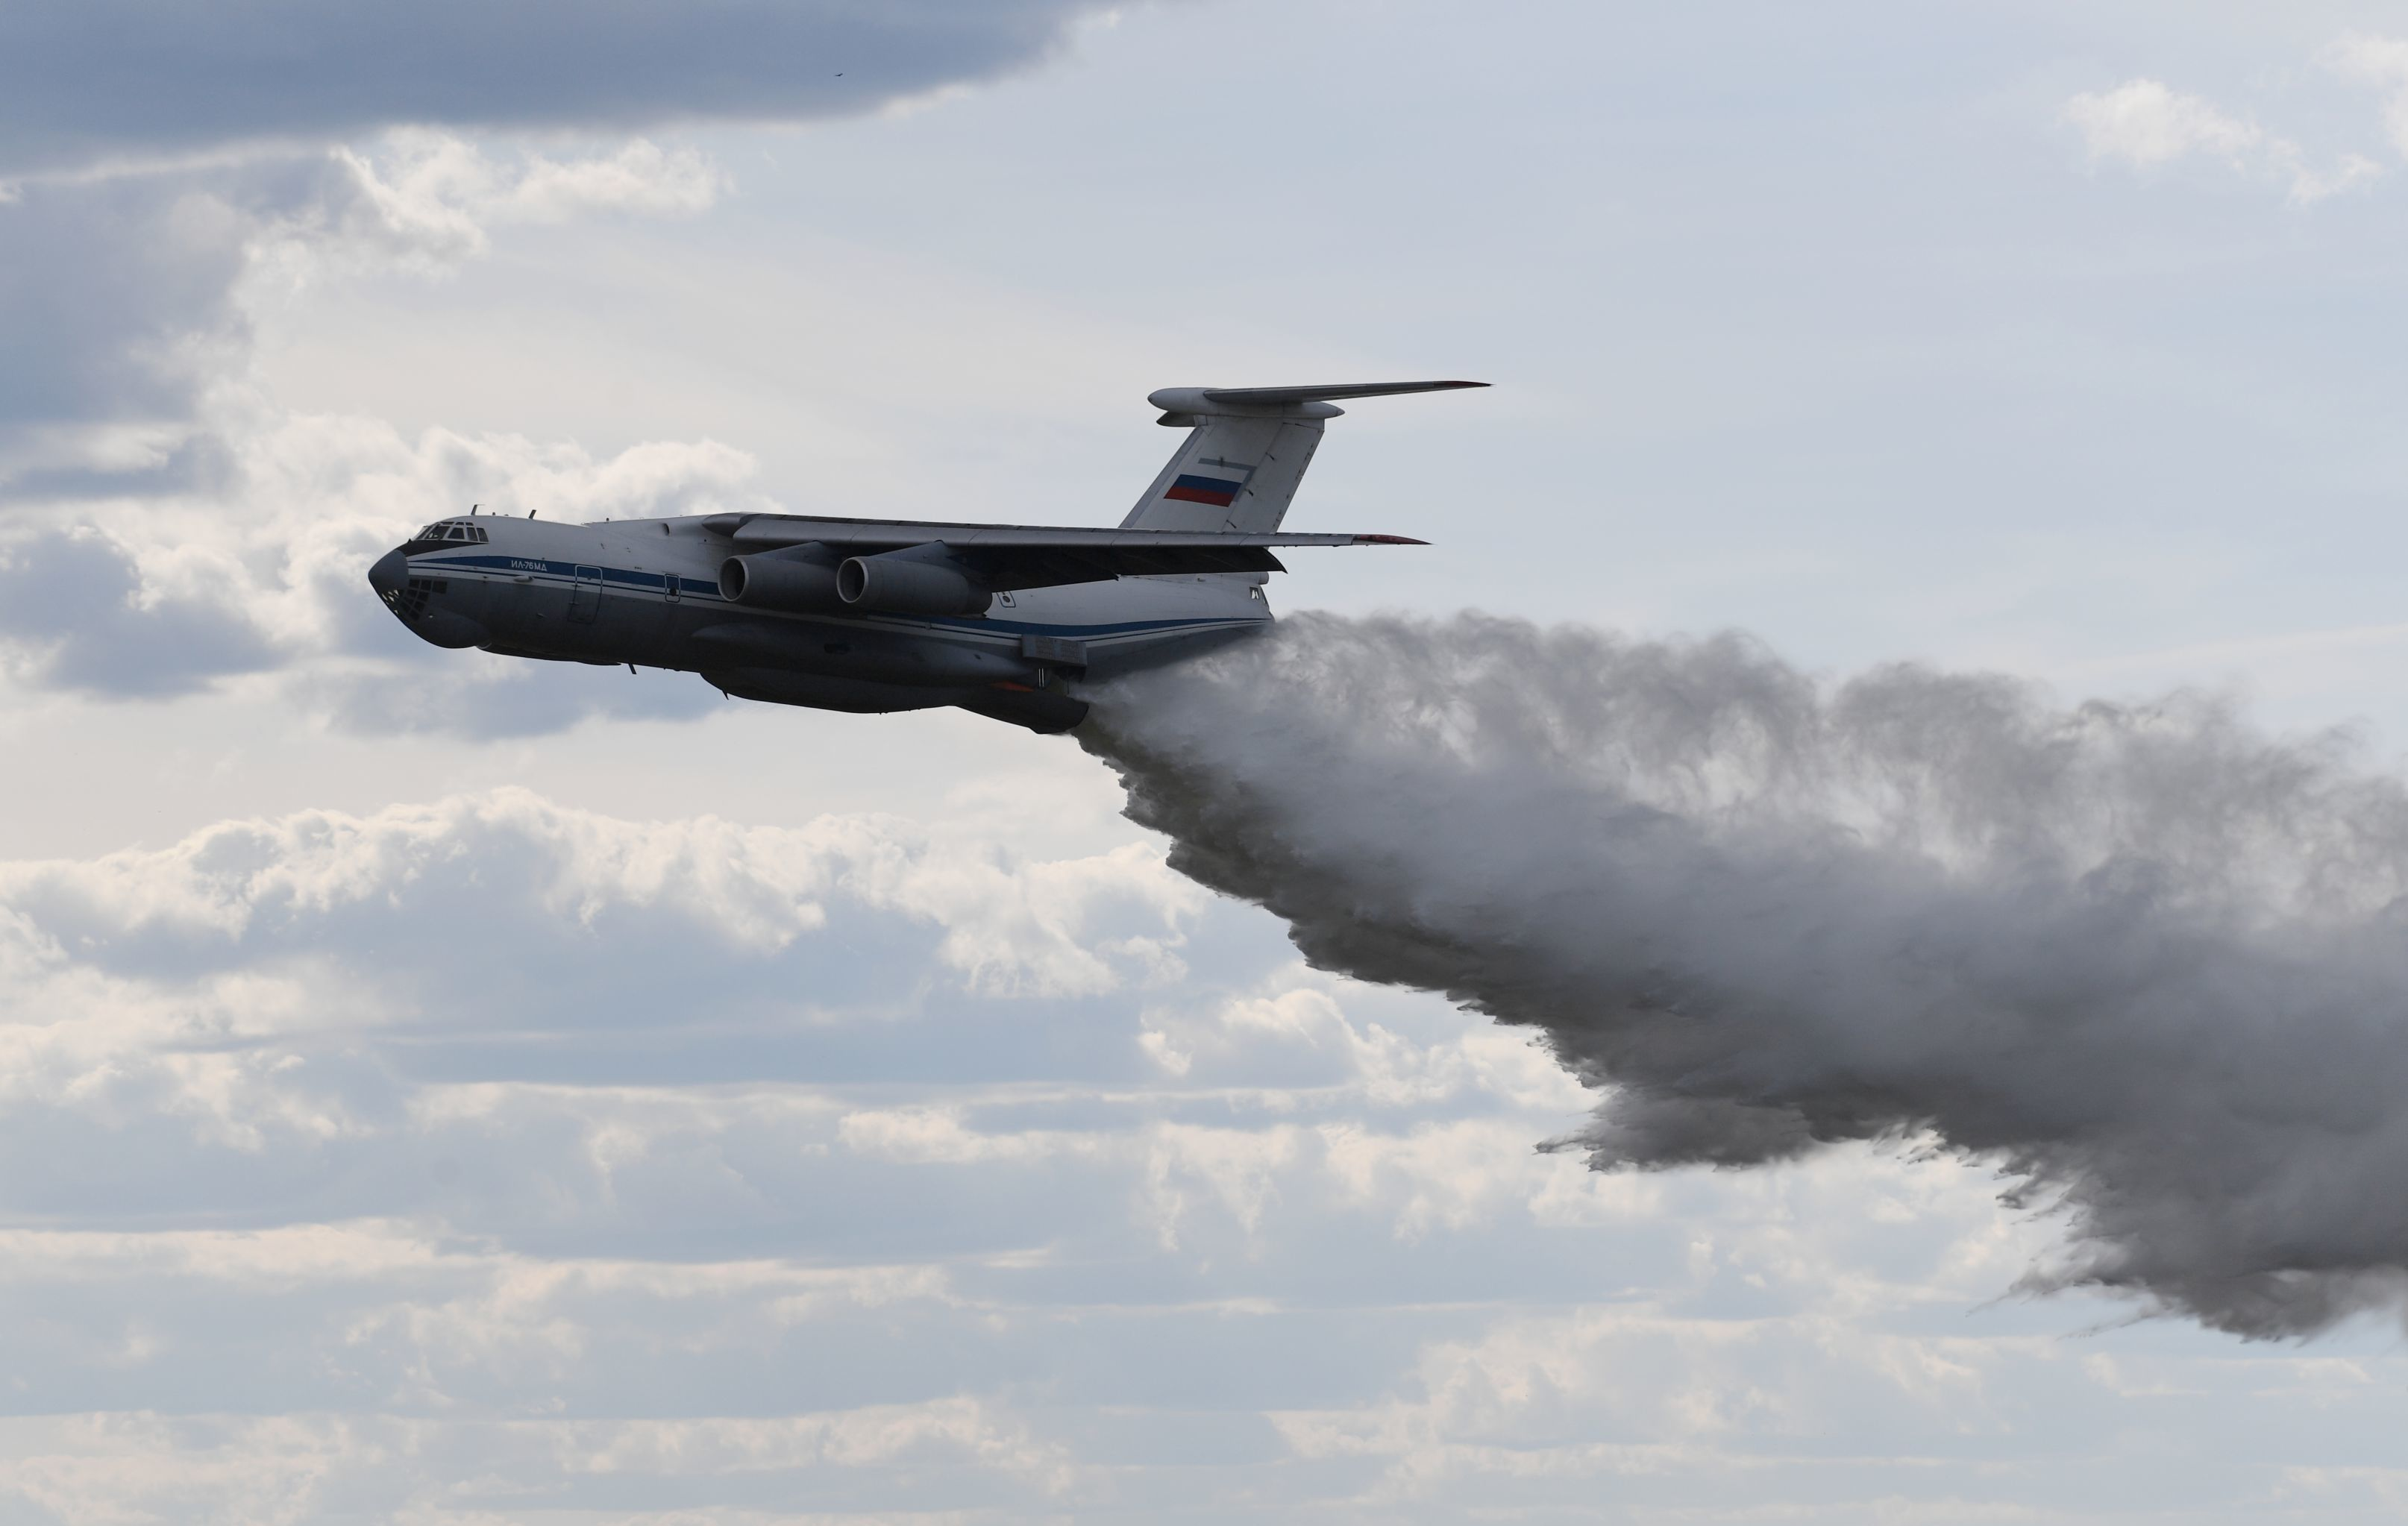 Aeronave de transporte militar russa Il-76MD durante o fórum internacional Exército 2019